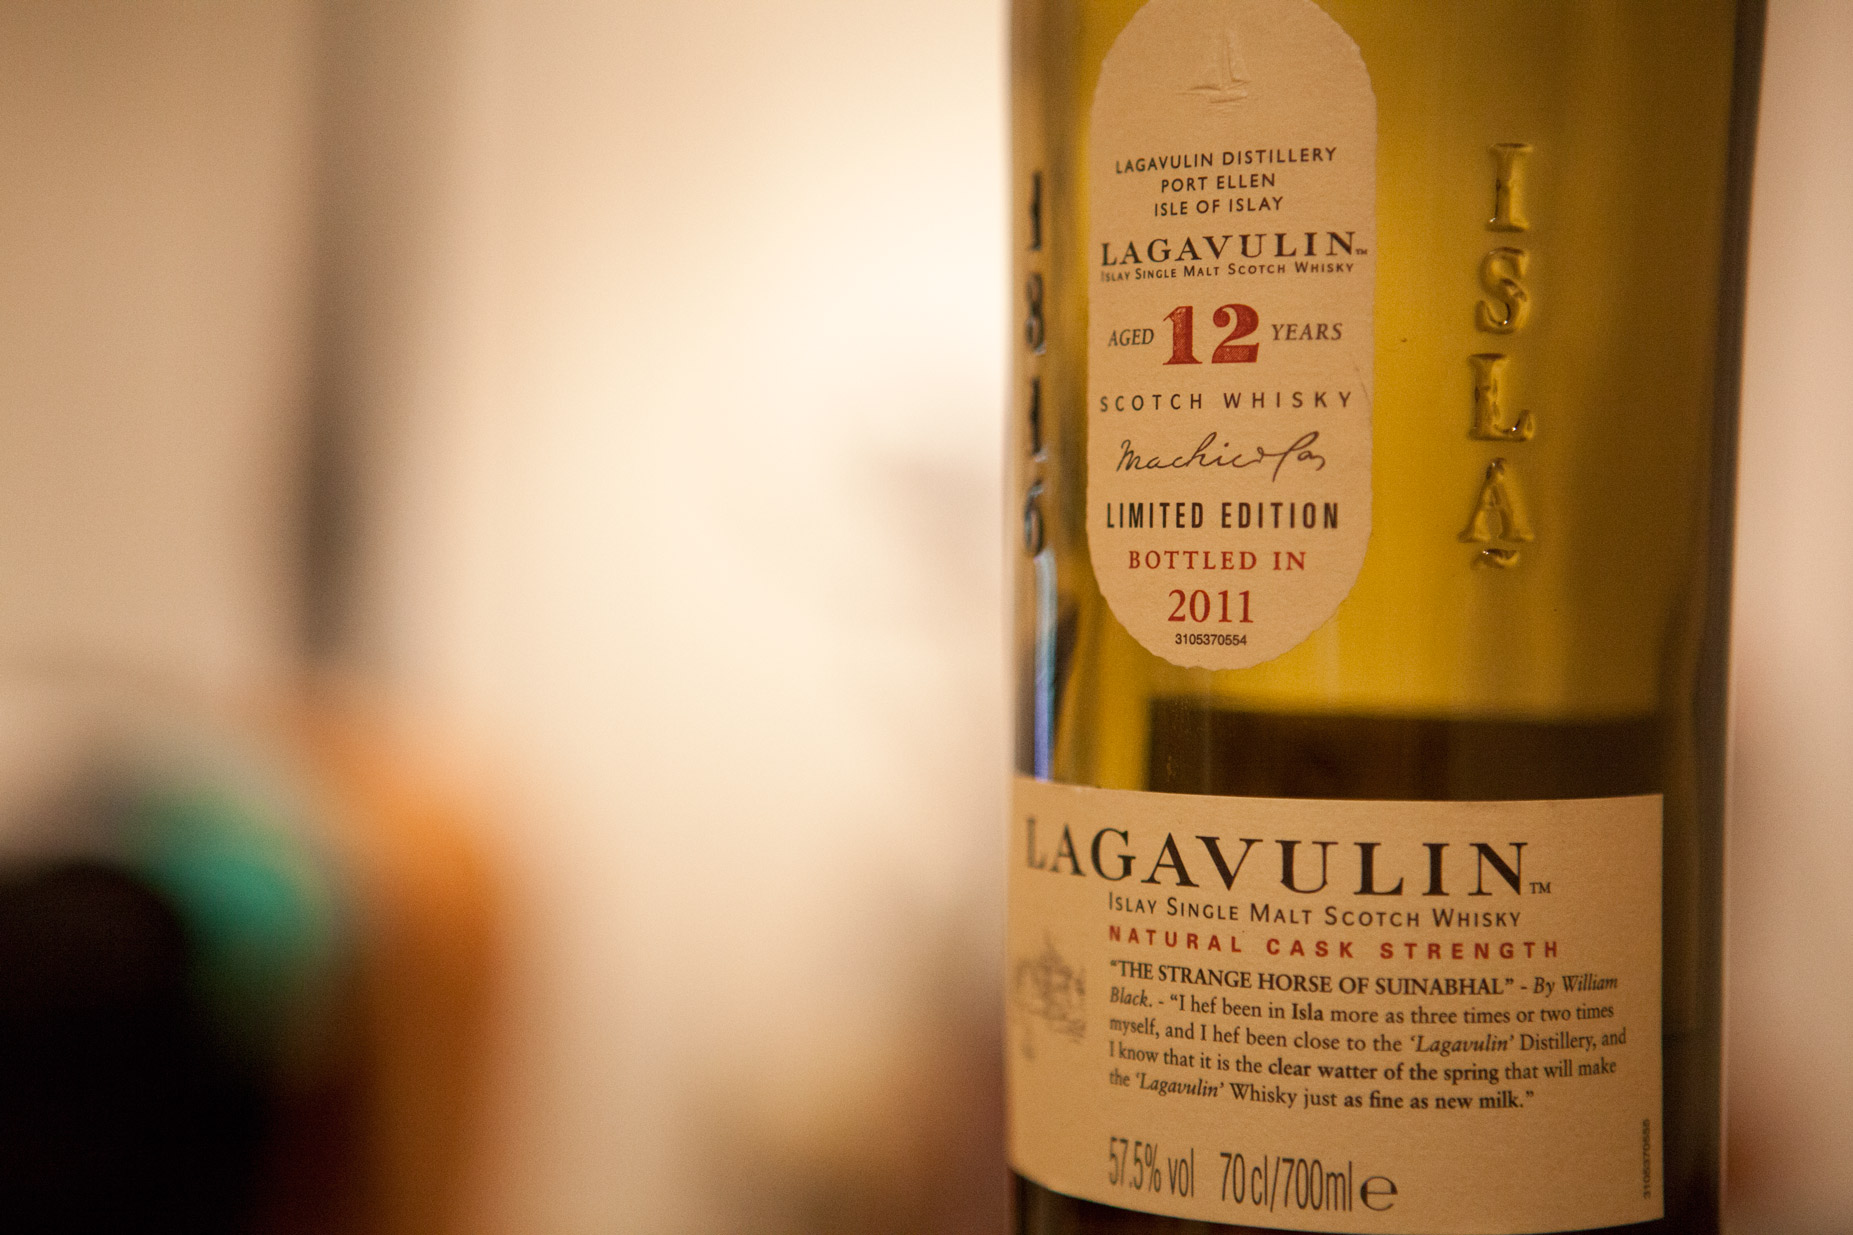 Lagavulin 12yr Cask Strength 2011 Limited Edition